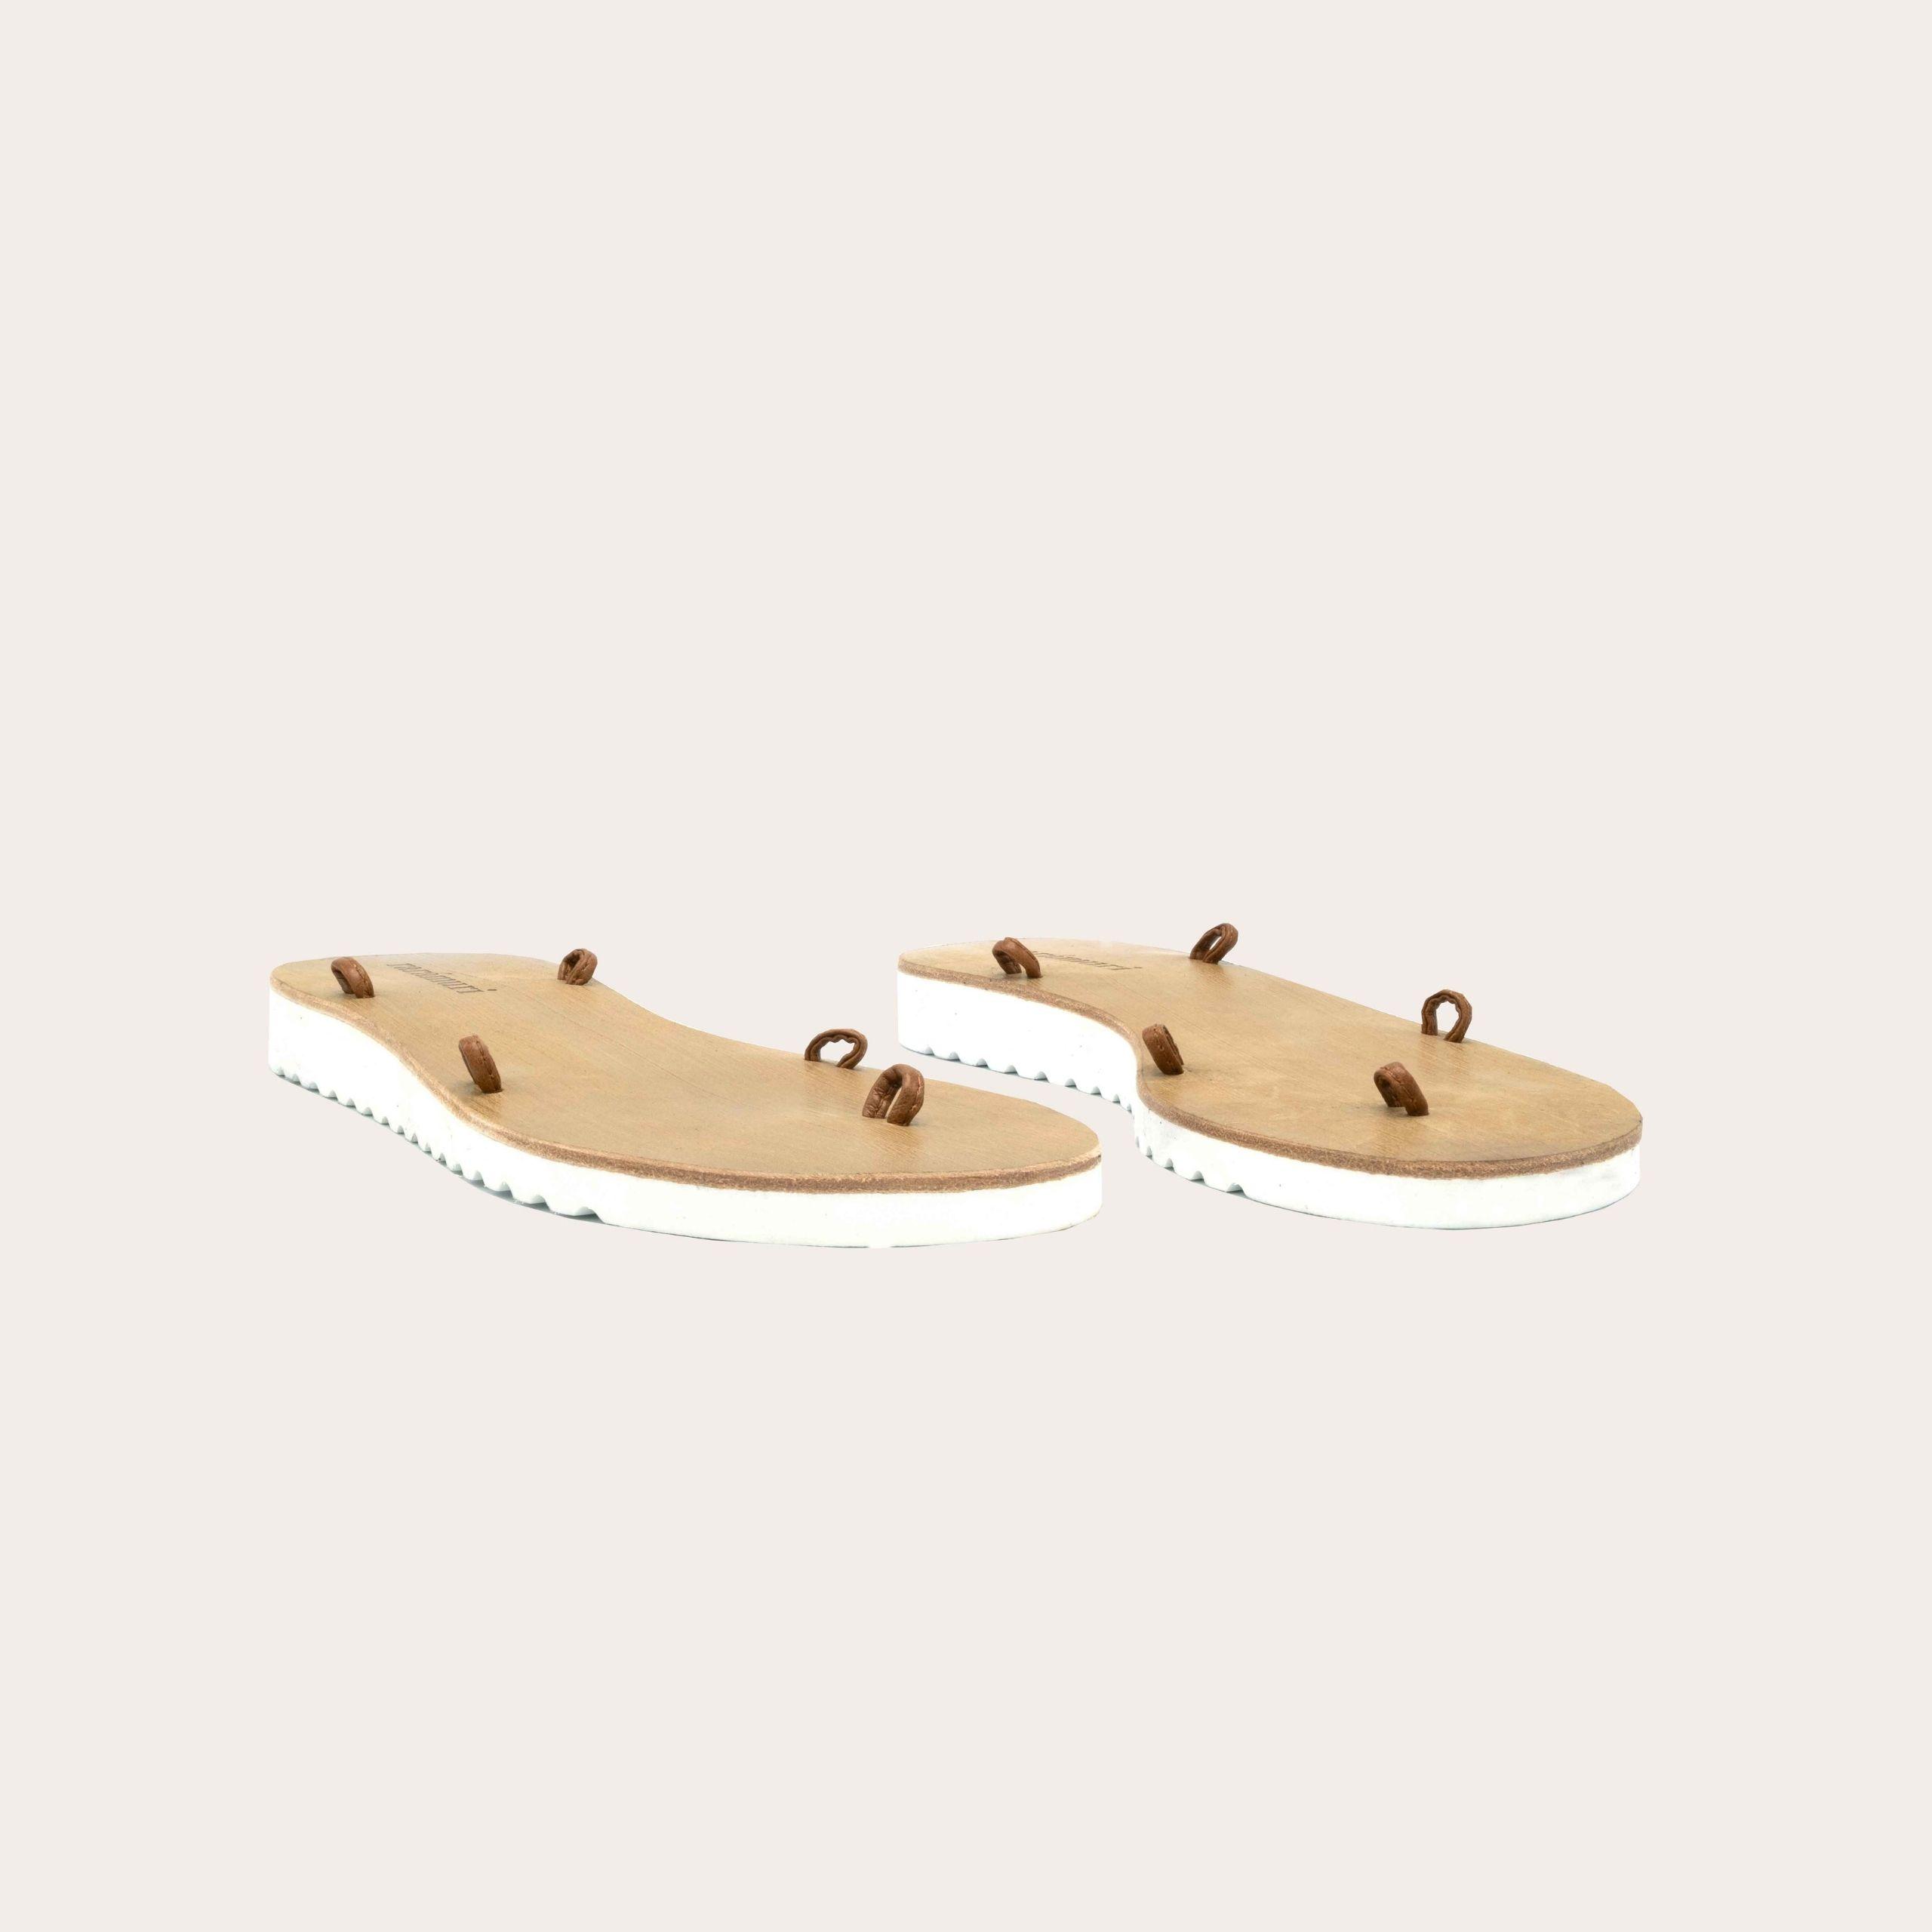 chalco-2_lintsandalen sandals travelsandals vegan sustainable sandals wikkelsandalen